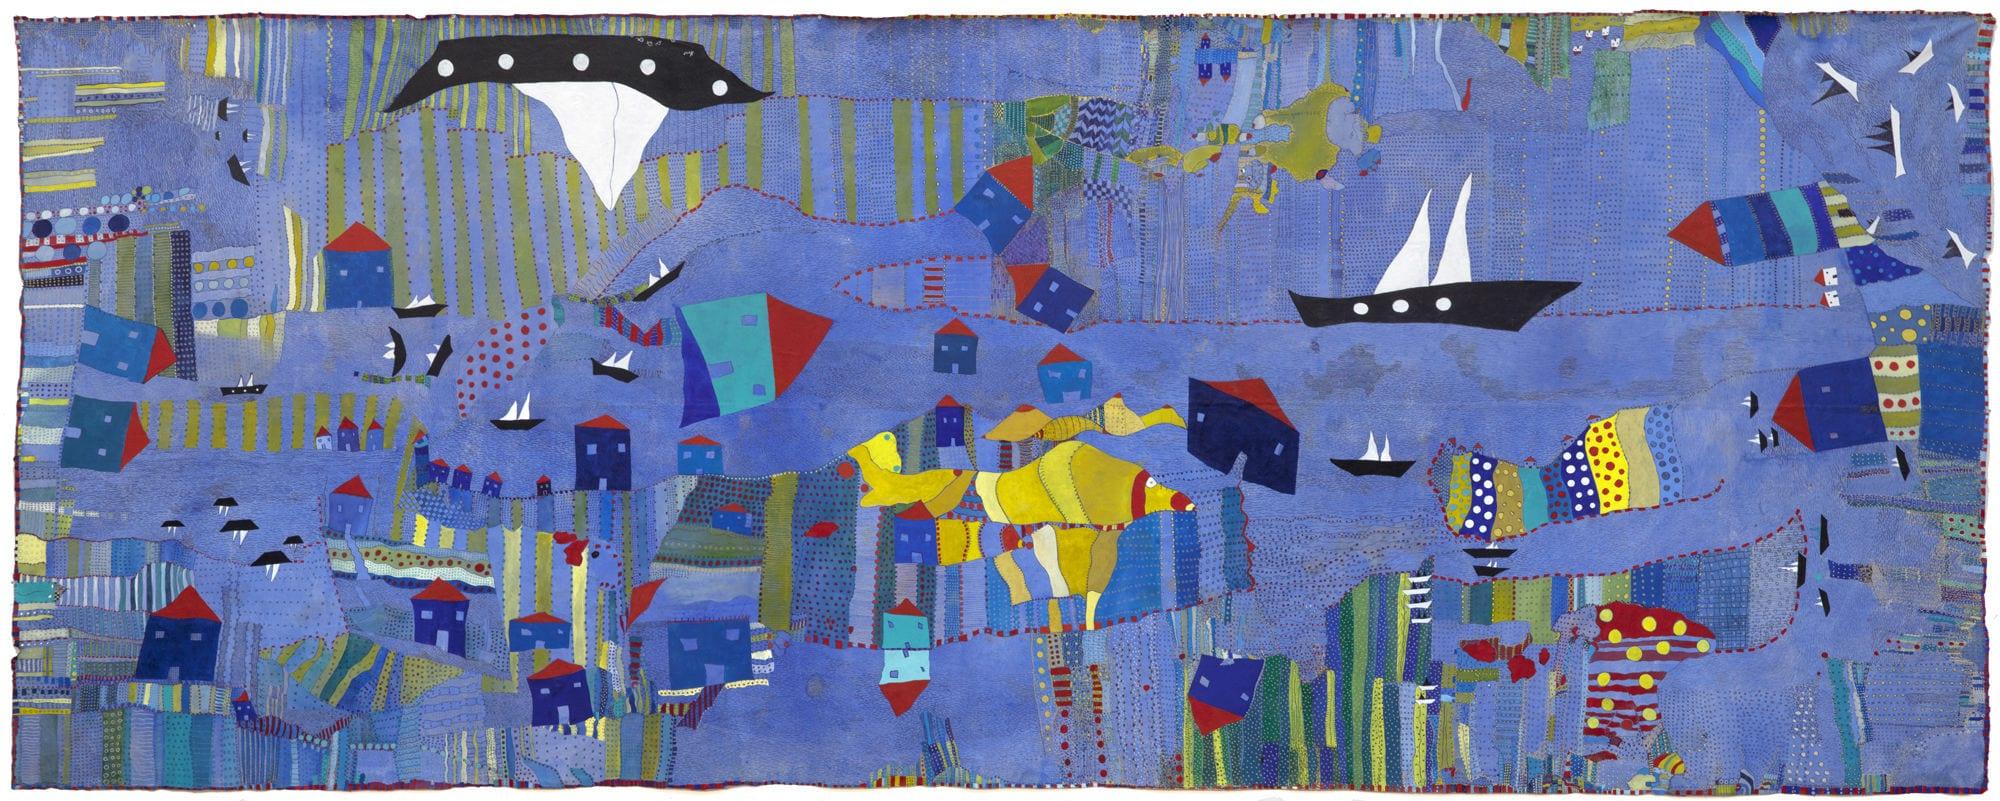 Huguette Caland, Le Grand Bleu, 2012. Courtesy Caland Family